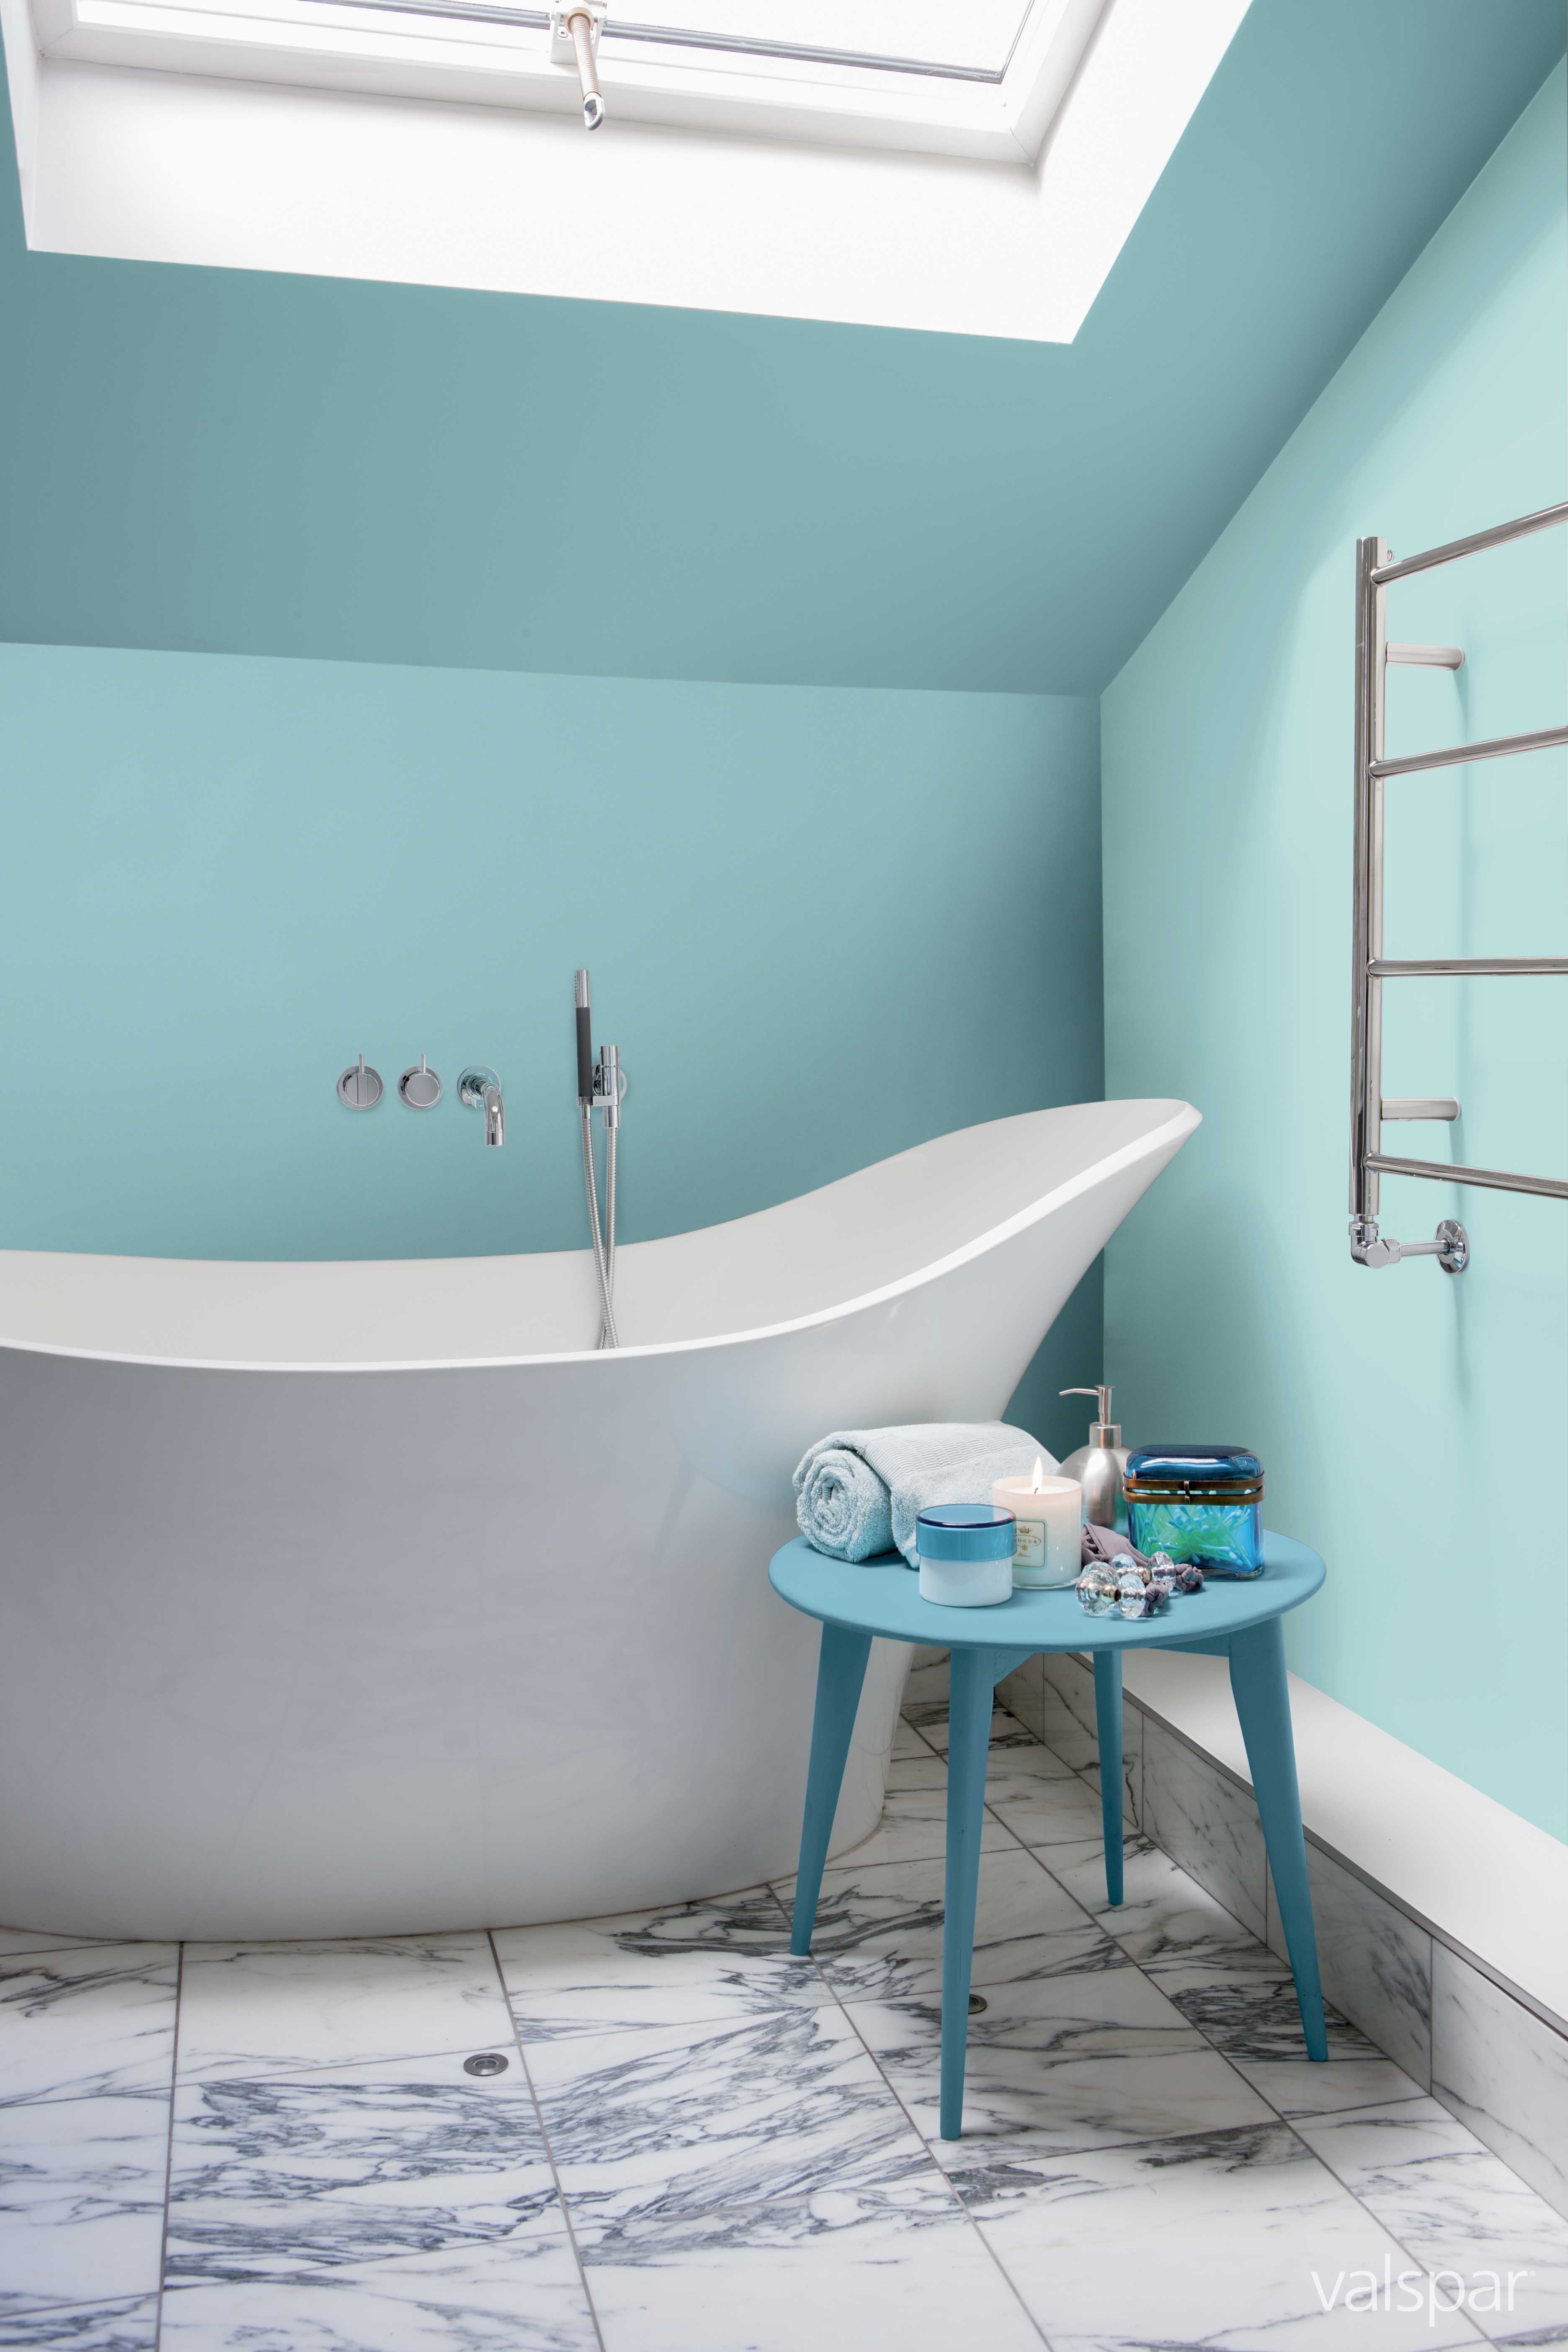 A lovely bright bathroom painted with Valspar Aquamarine